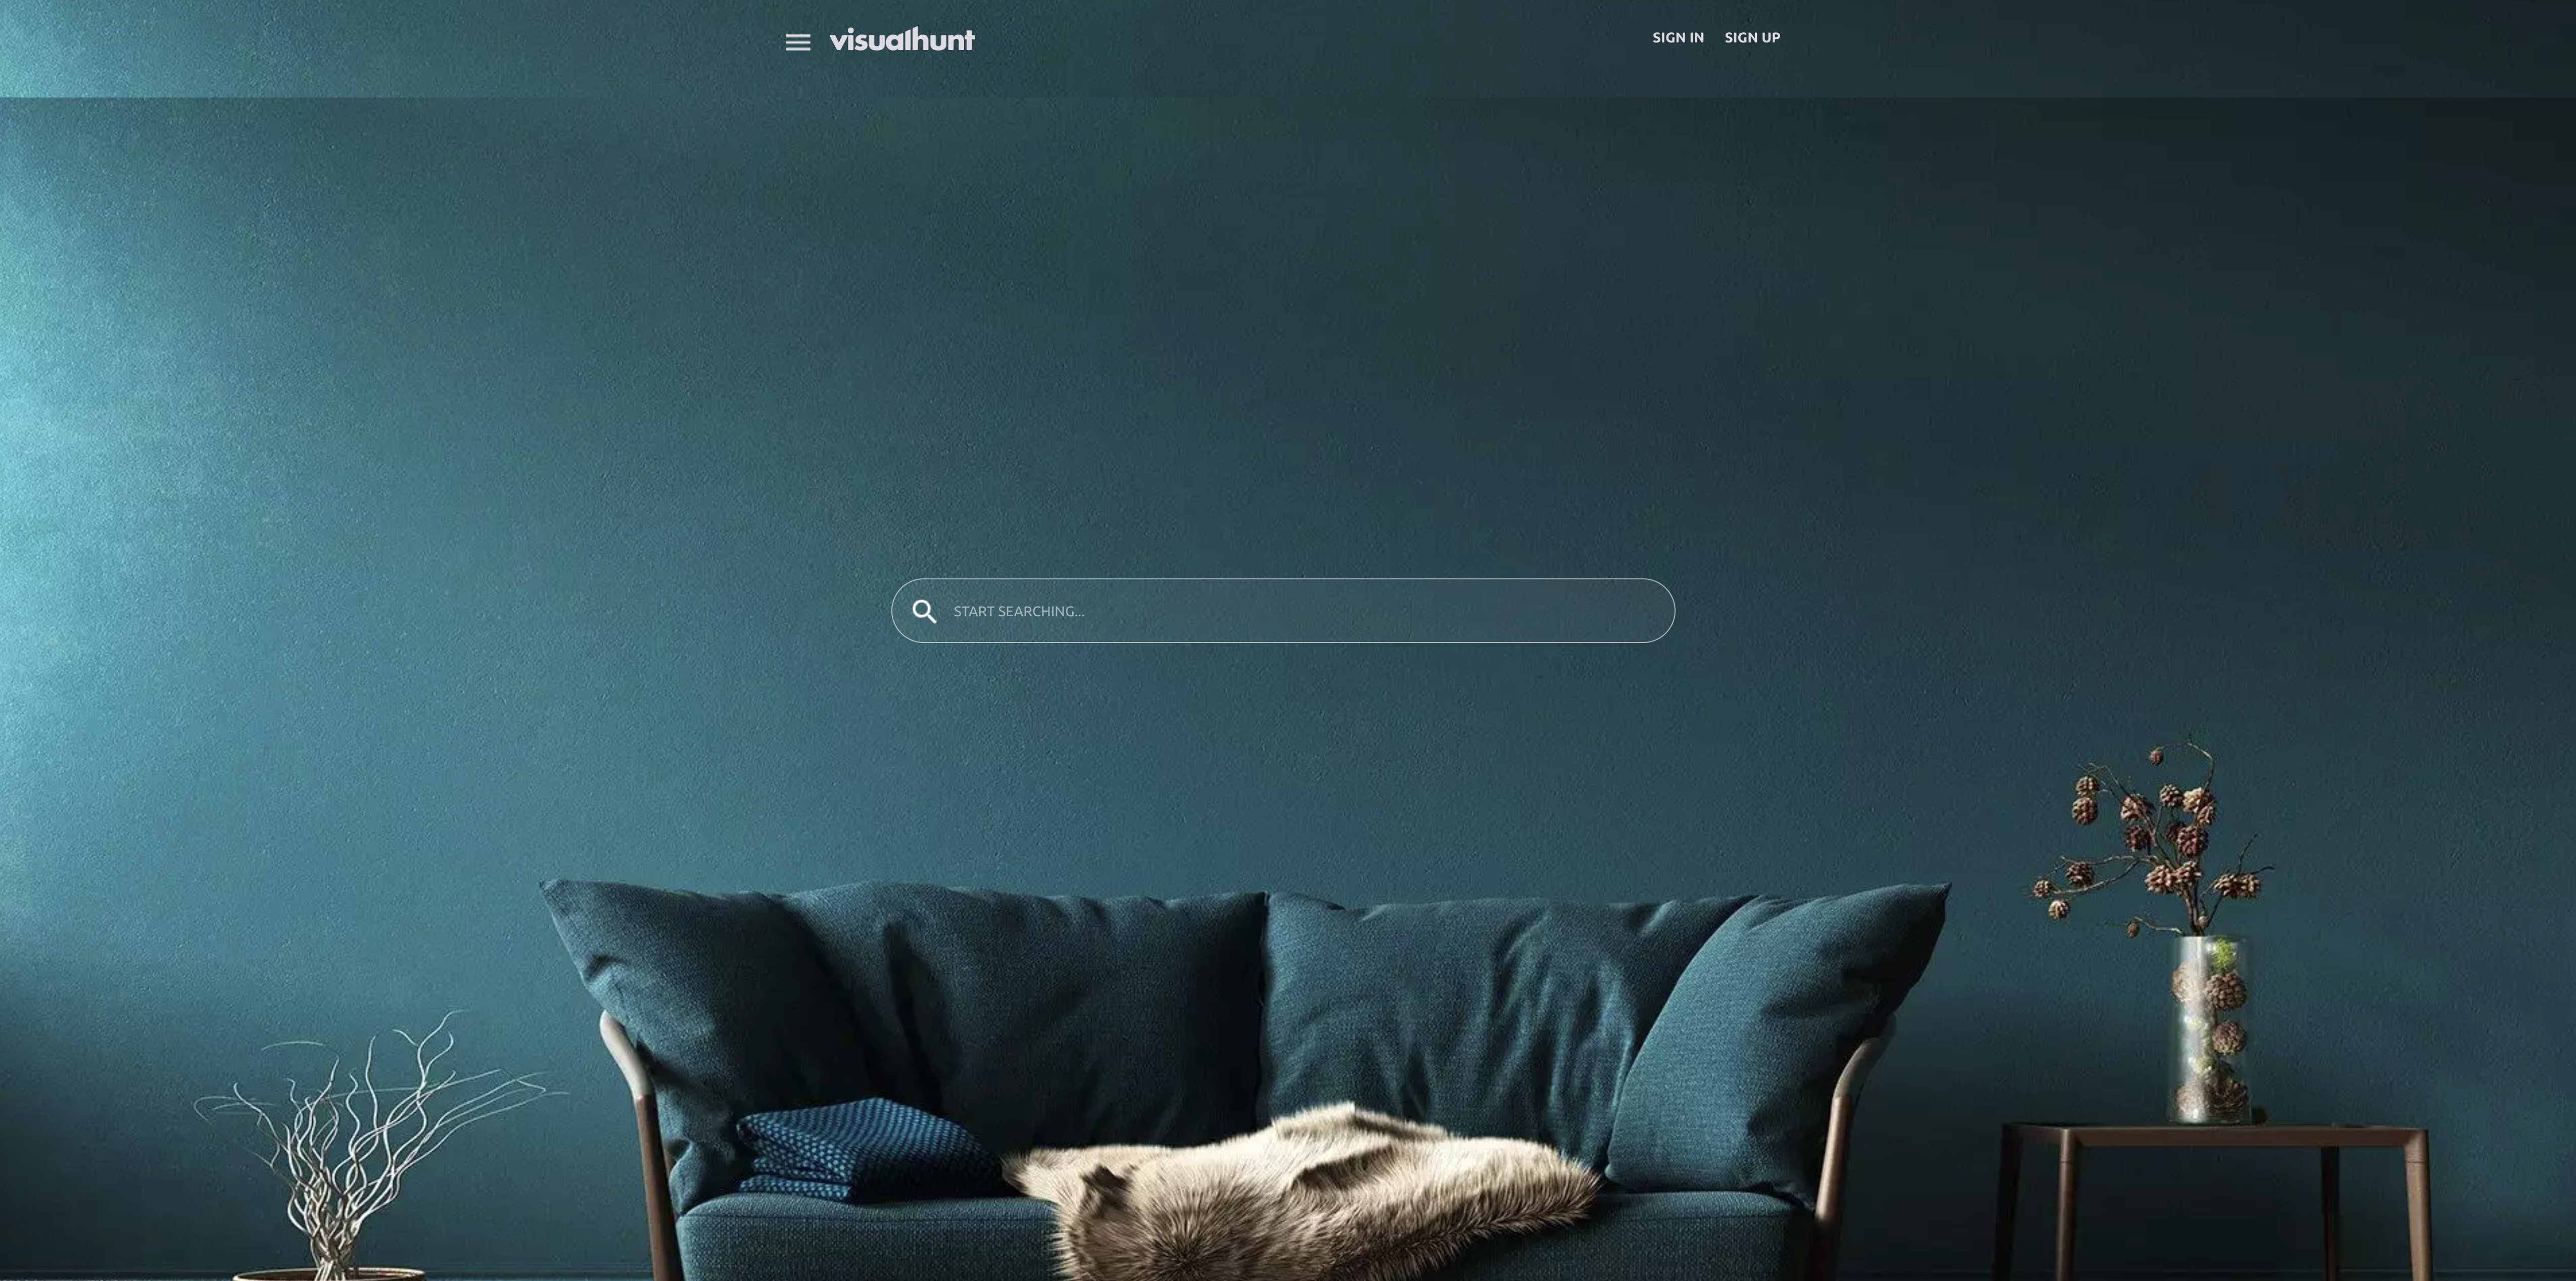 visualhunt.com